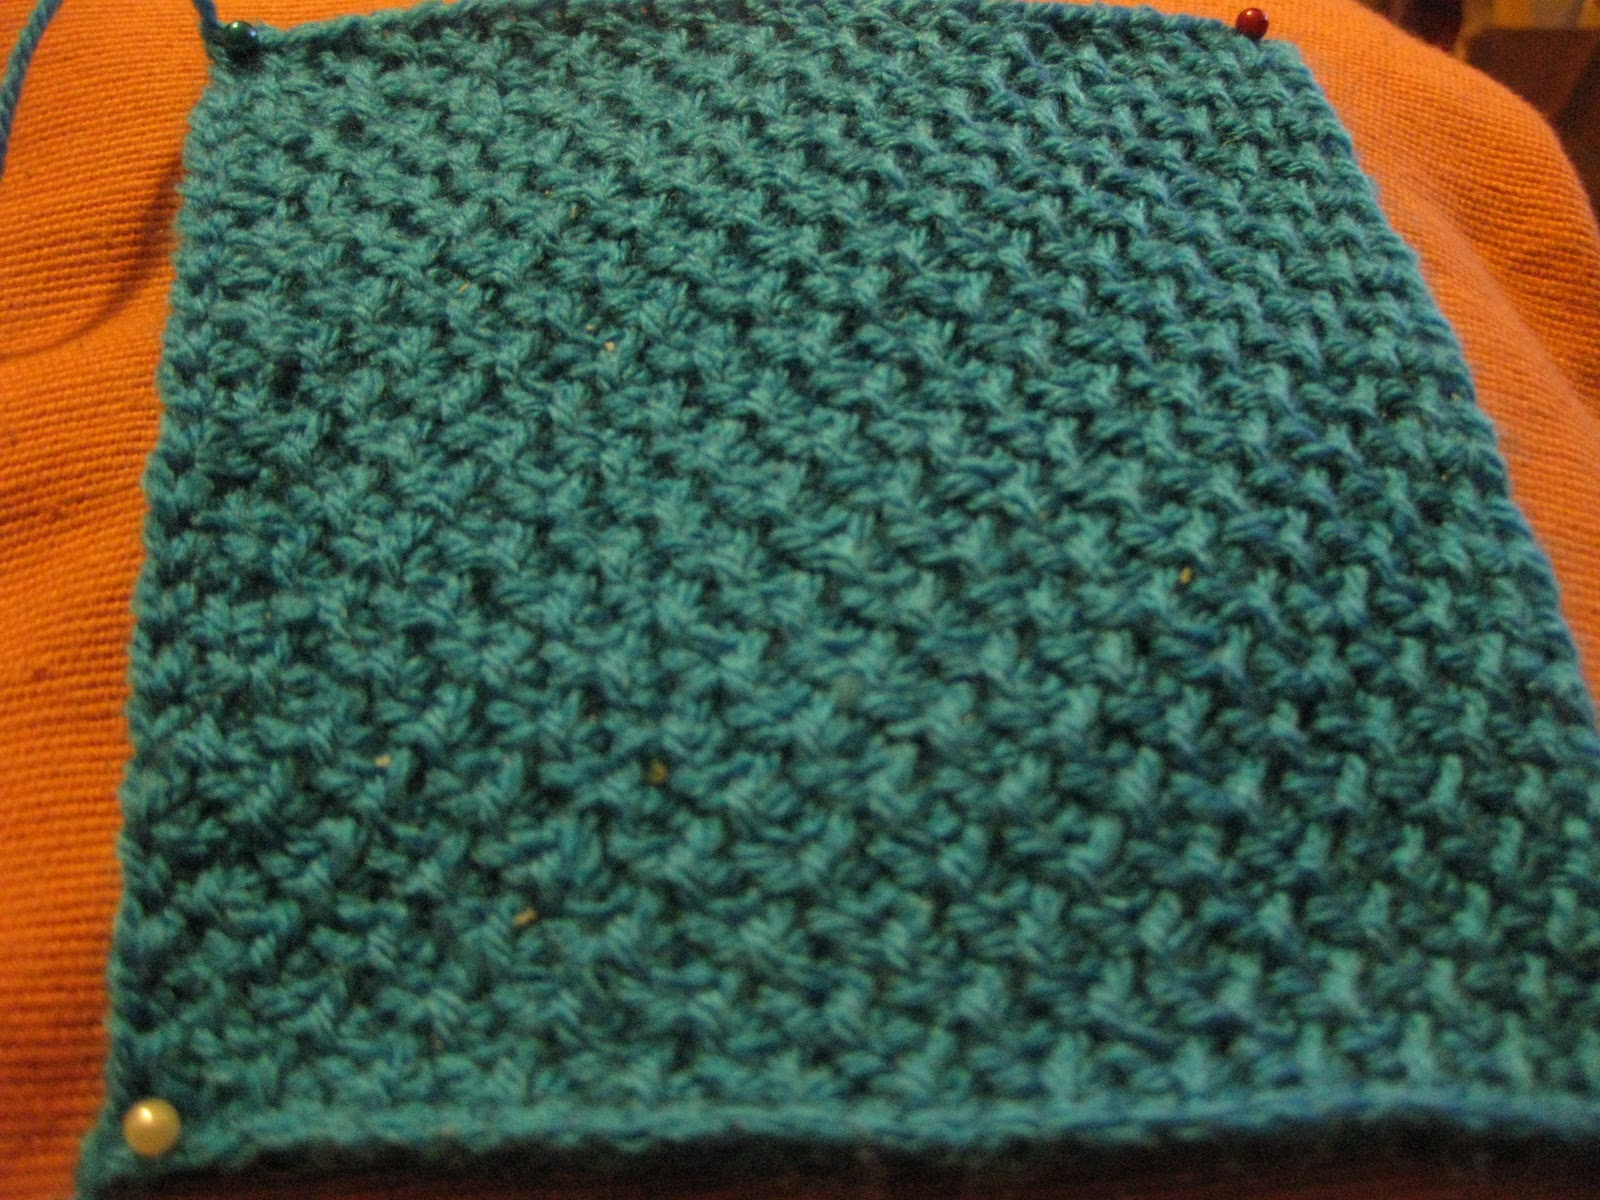 Crochet Stitch Honeycomb : Square 9 - Tunisian Popcorn Stitch